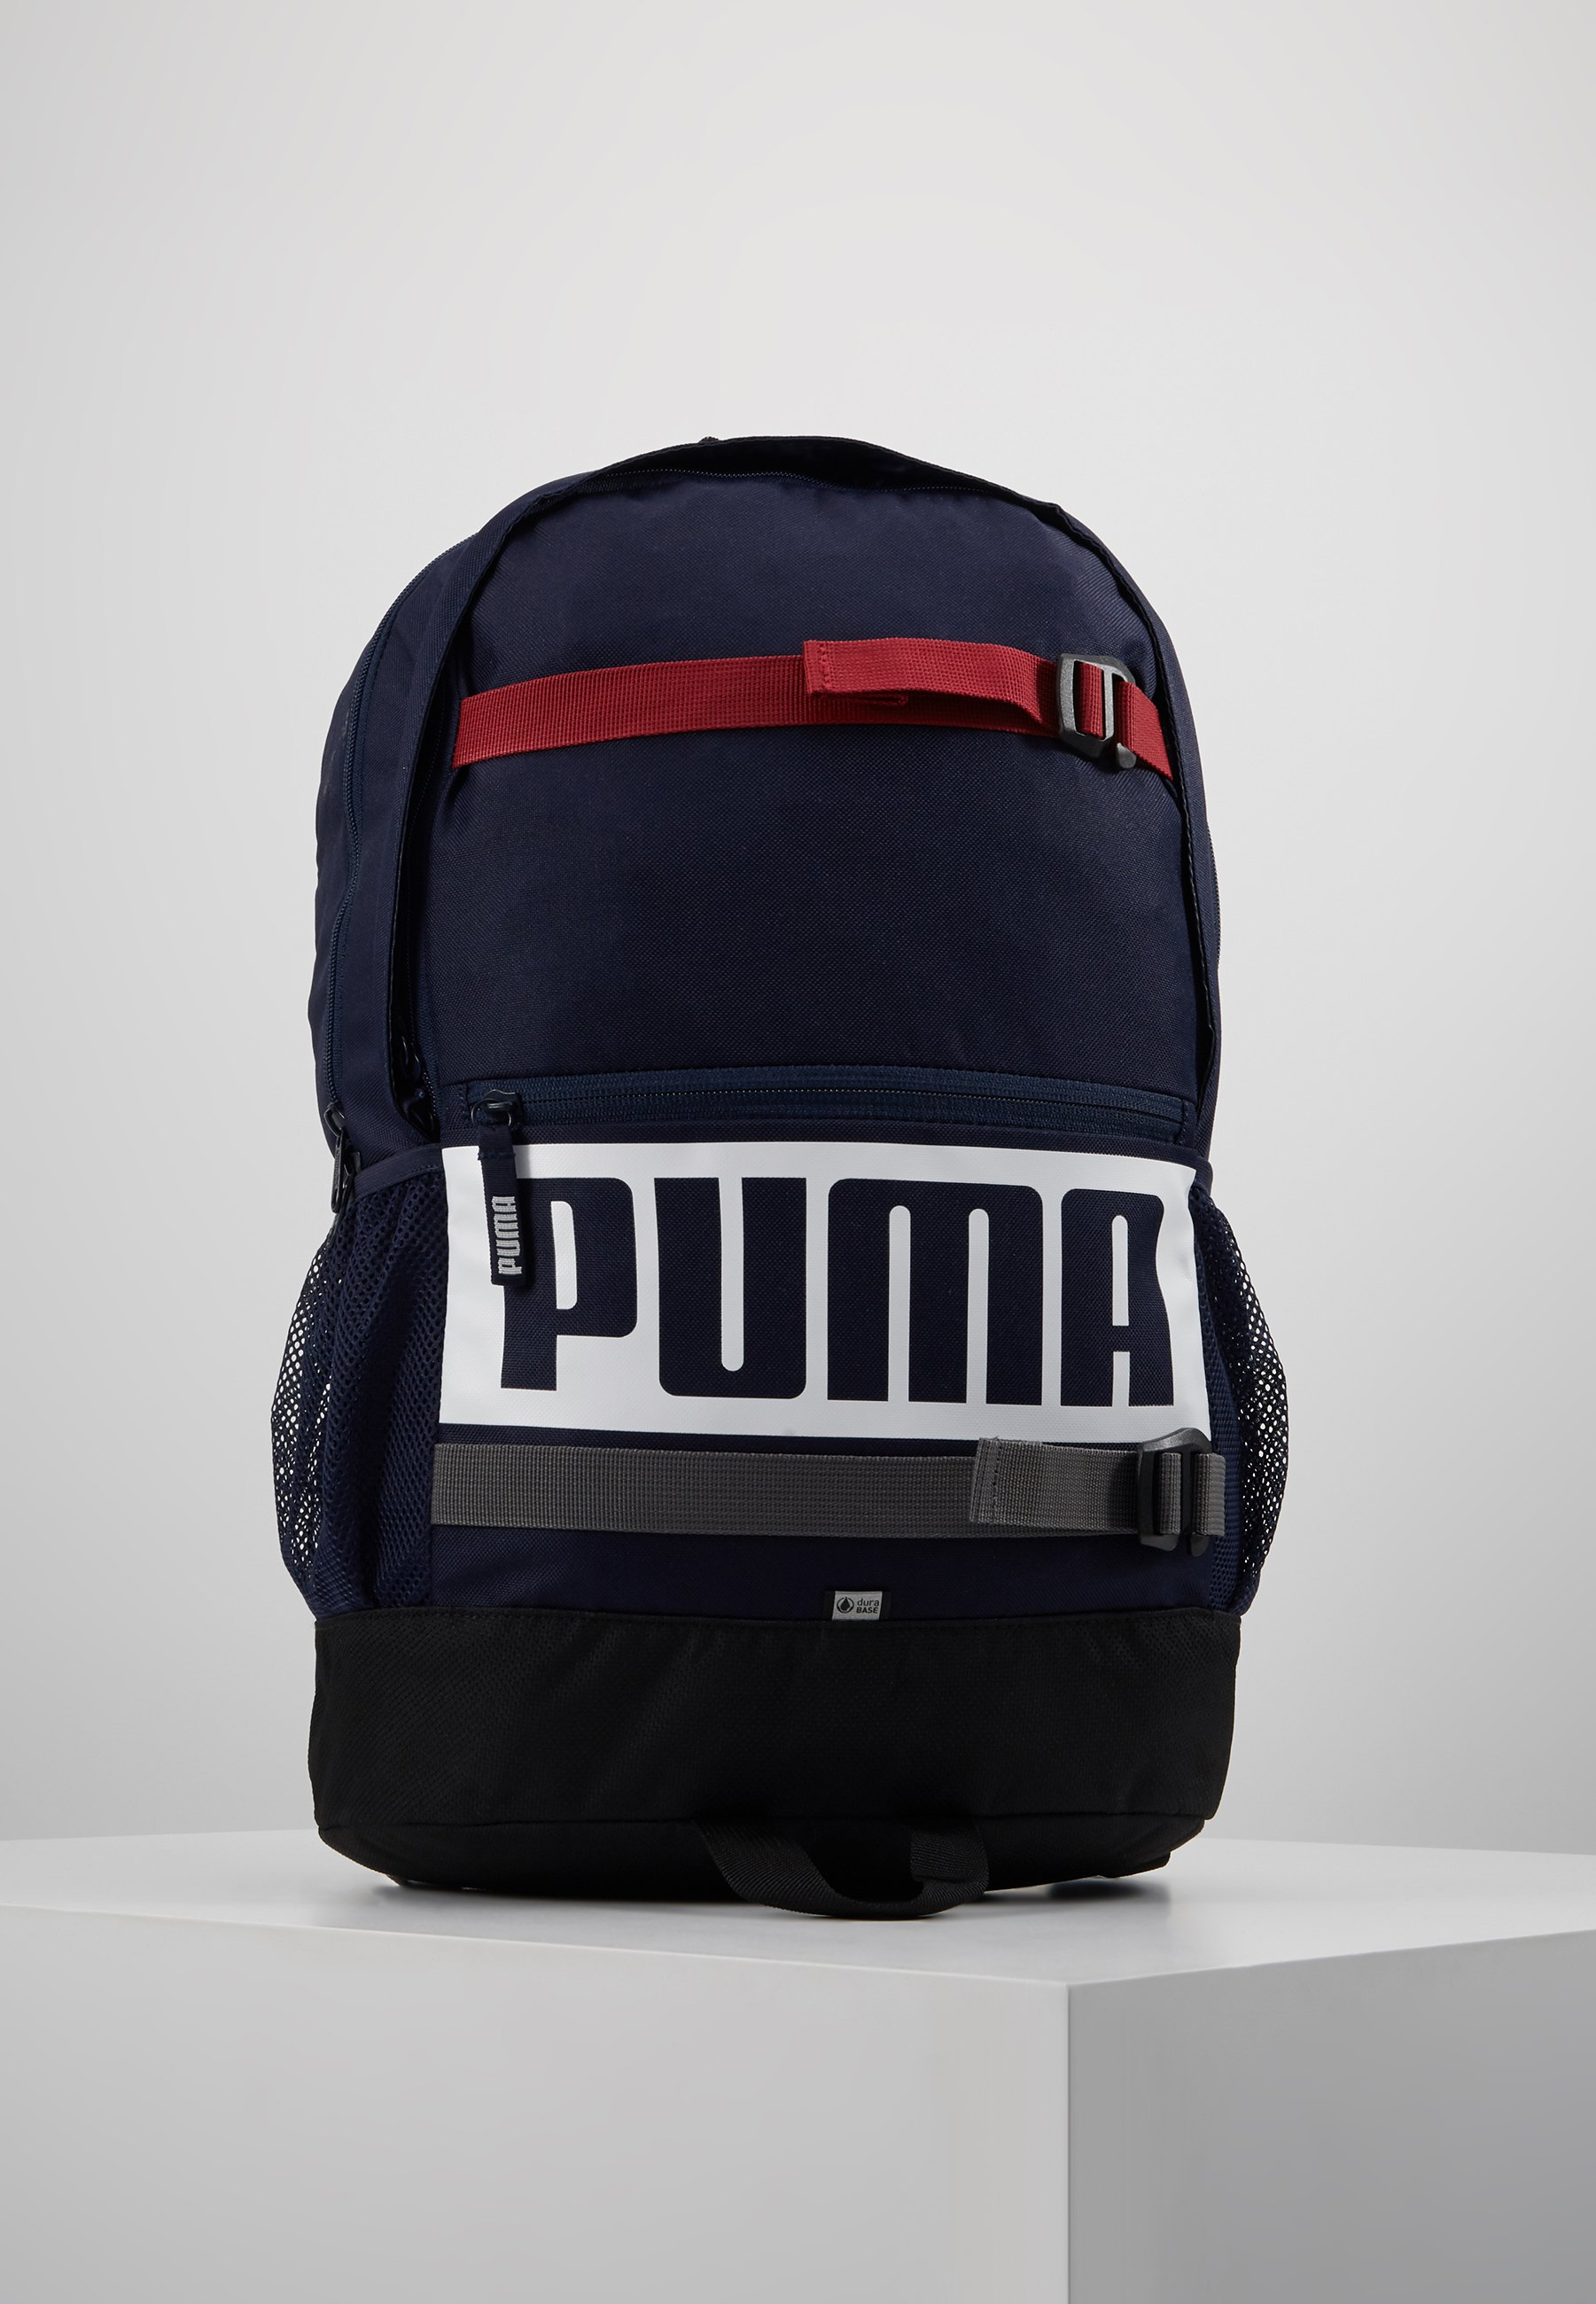 Peacoat Deck Puma Dos BackpackSac À e2bWH9EDIY